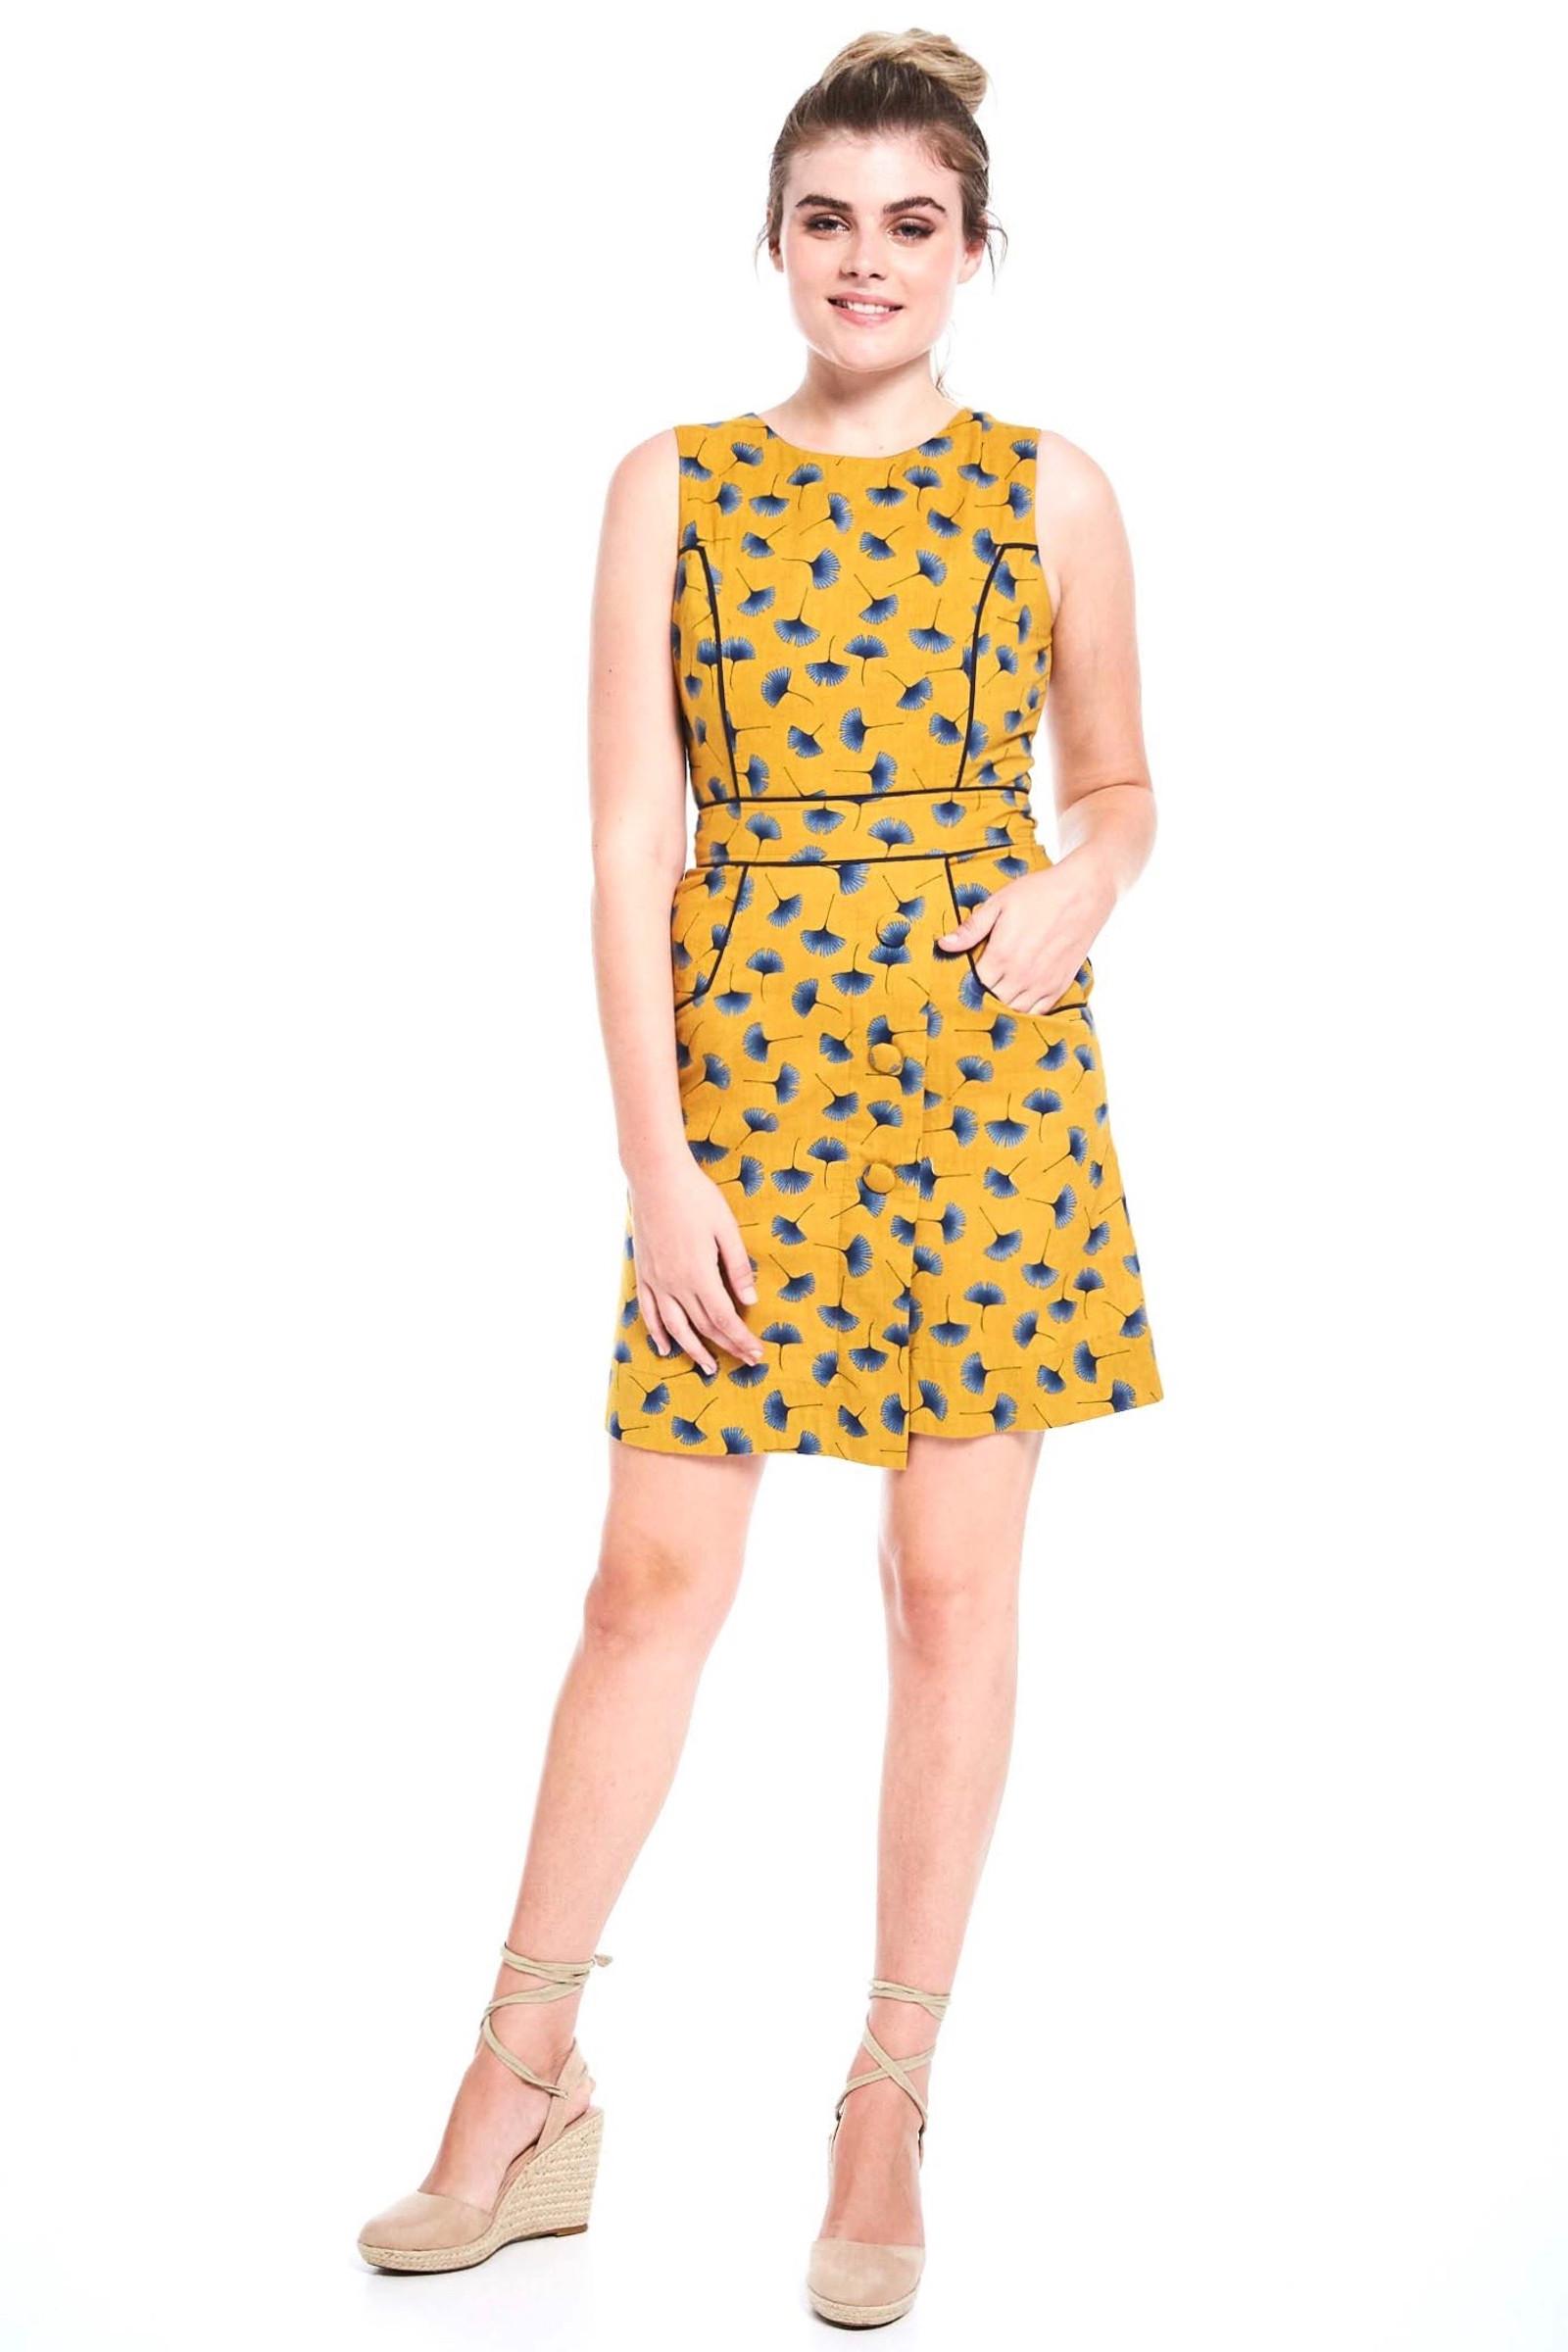 Abby Tunic - Ginkgo Mustard